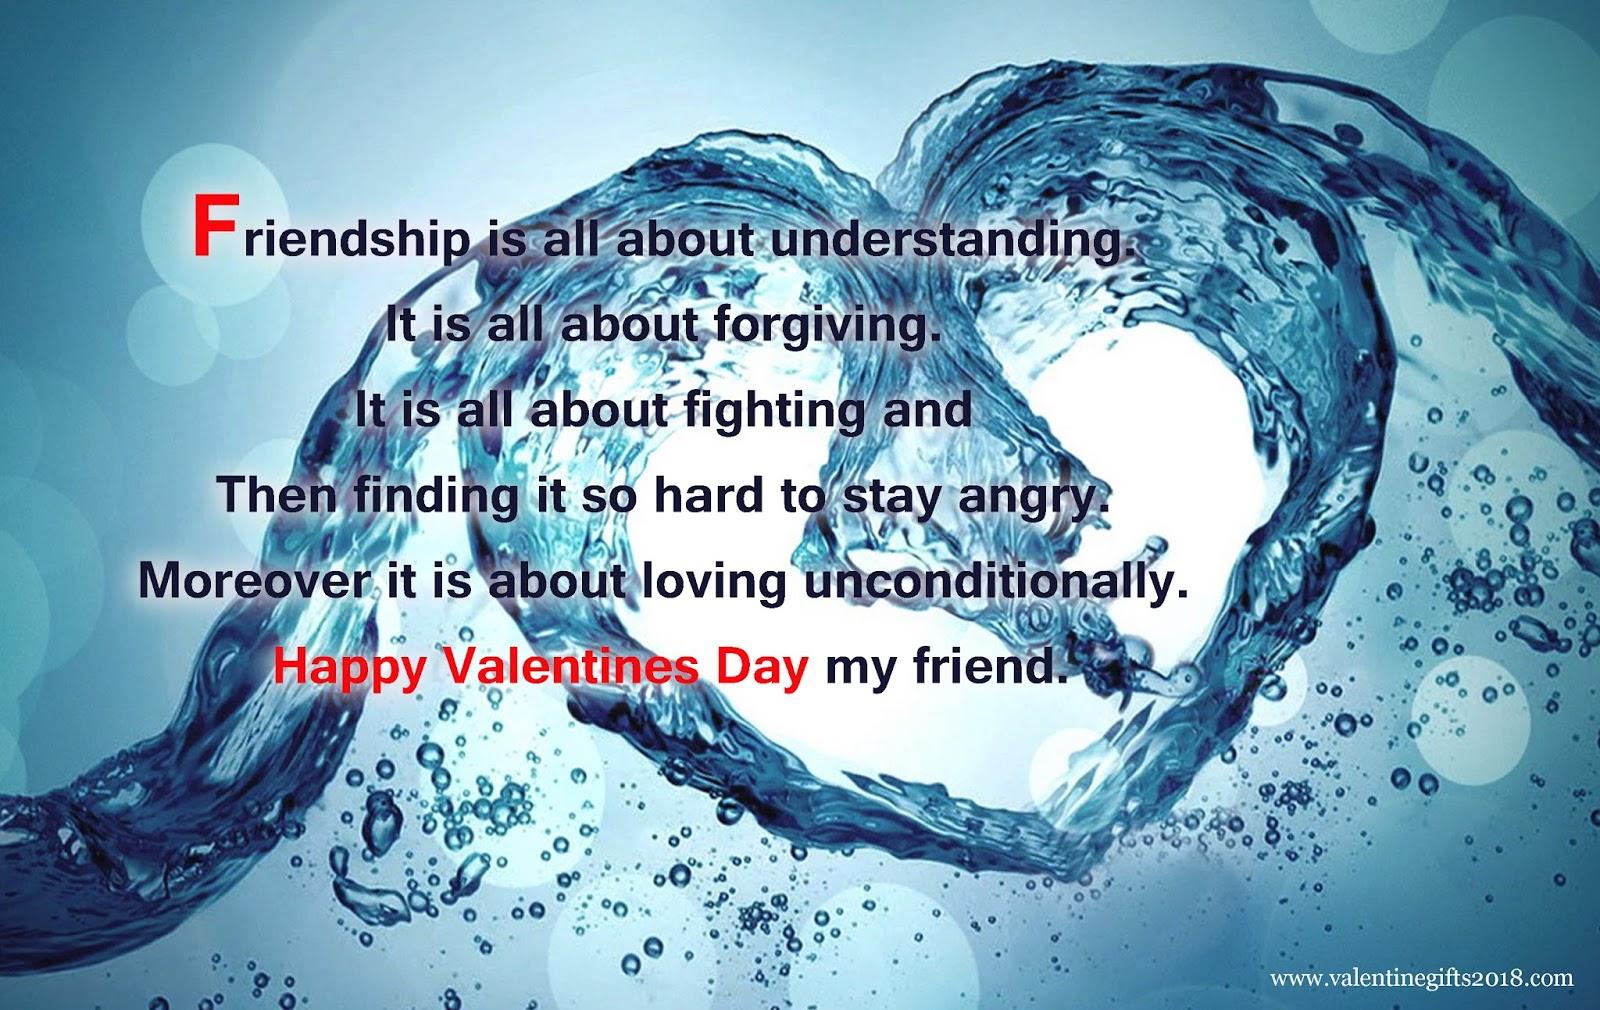 Valentine day cards for best friends valentine gifts 2018 cool top 10 valentine day cards for best friends send to your best friends kristyandbryce Choice Image